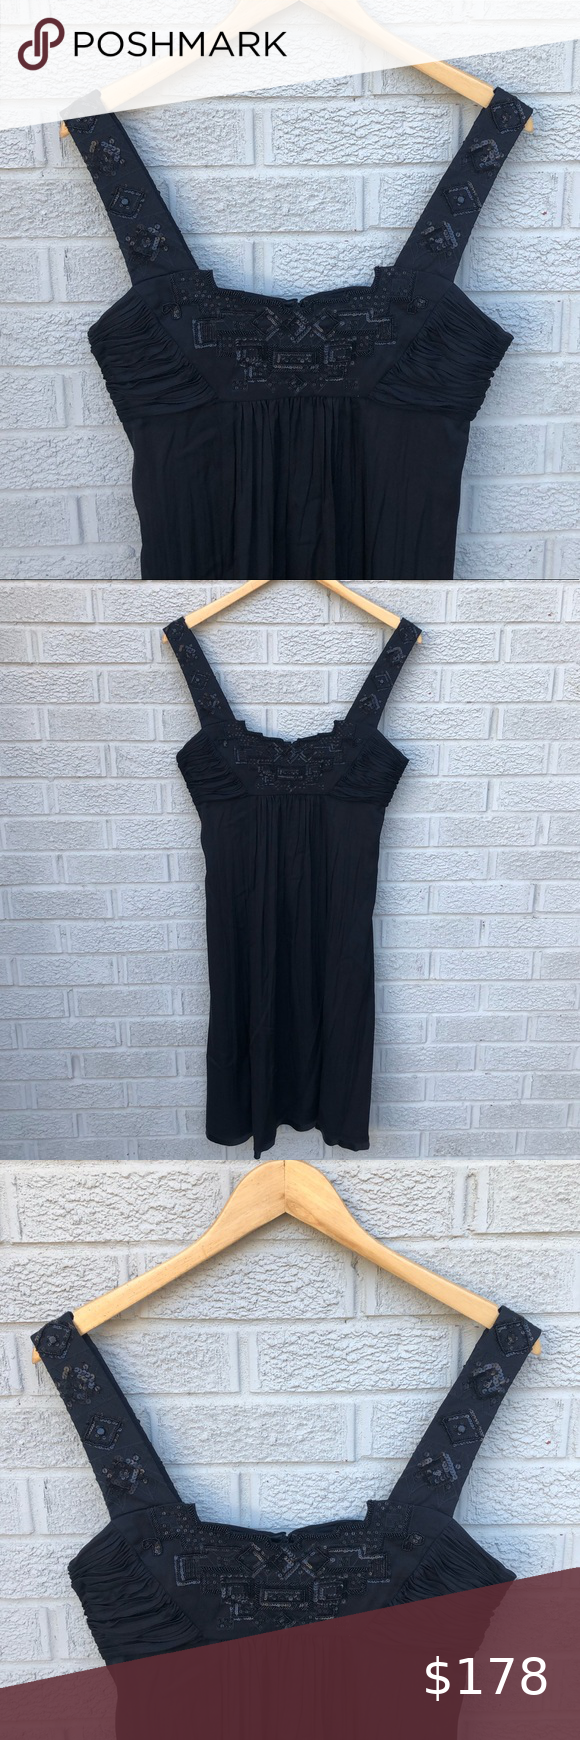 Elie Tahari Tara Beaded Sequin Silk Black Dress Black Silk Dress Elie Tahari Dresses Black Dress [ 1740 x 580 Pixel ]